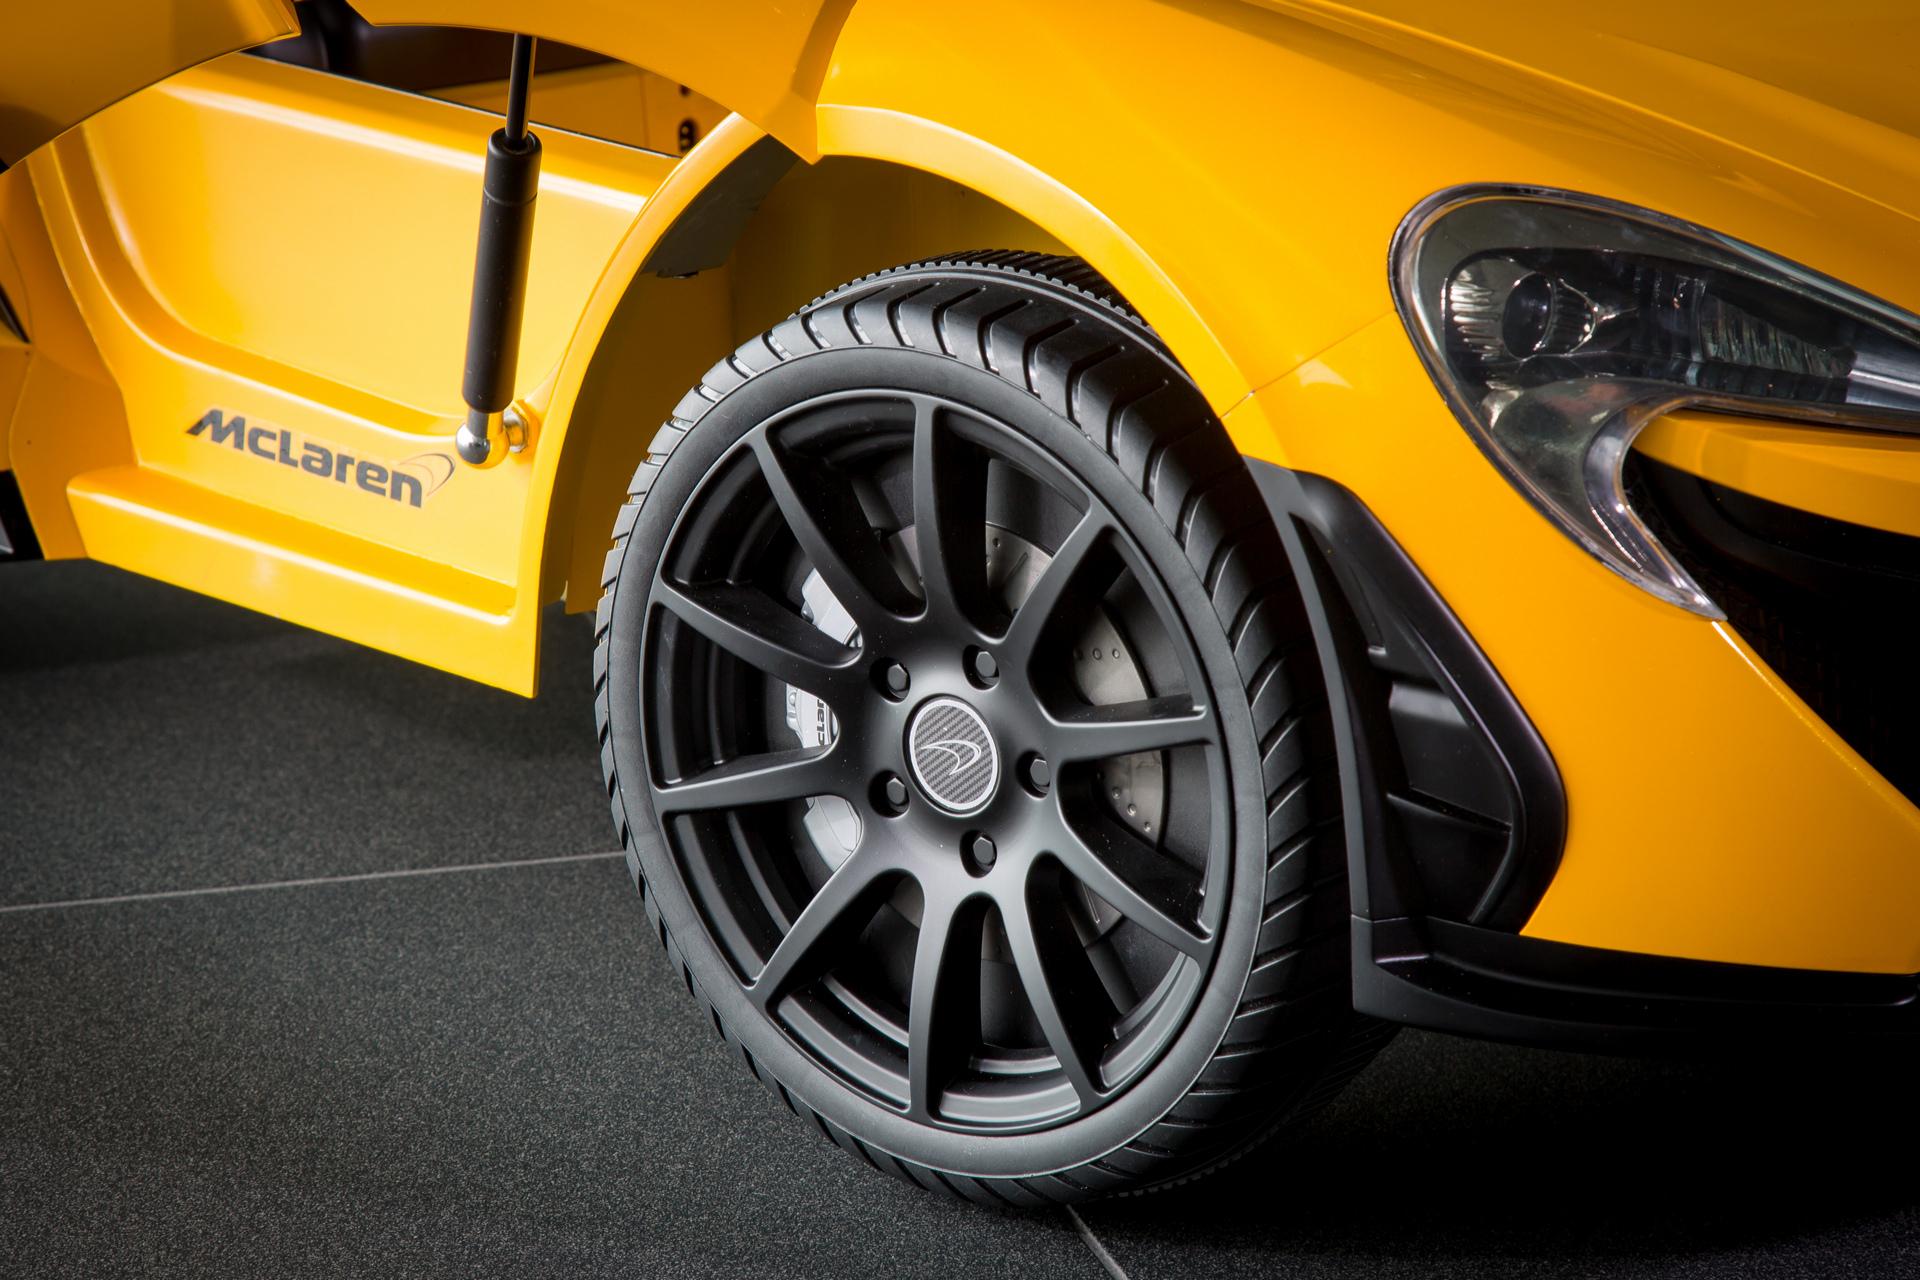 The latest McLaren P1™ is Pure Electric © McLaren Automotive